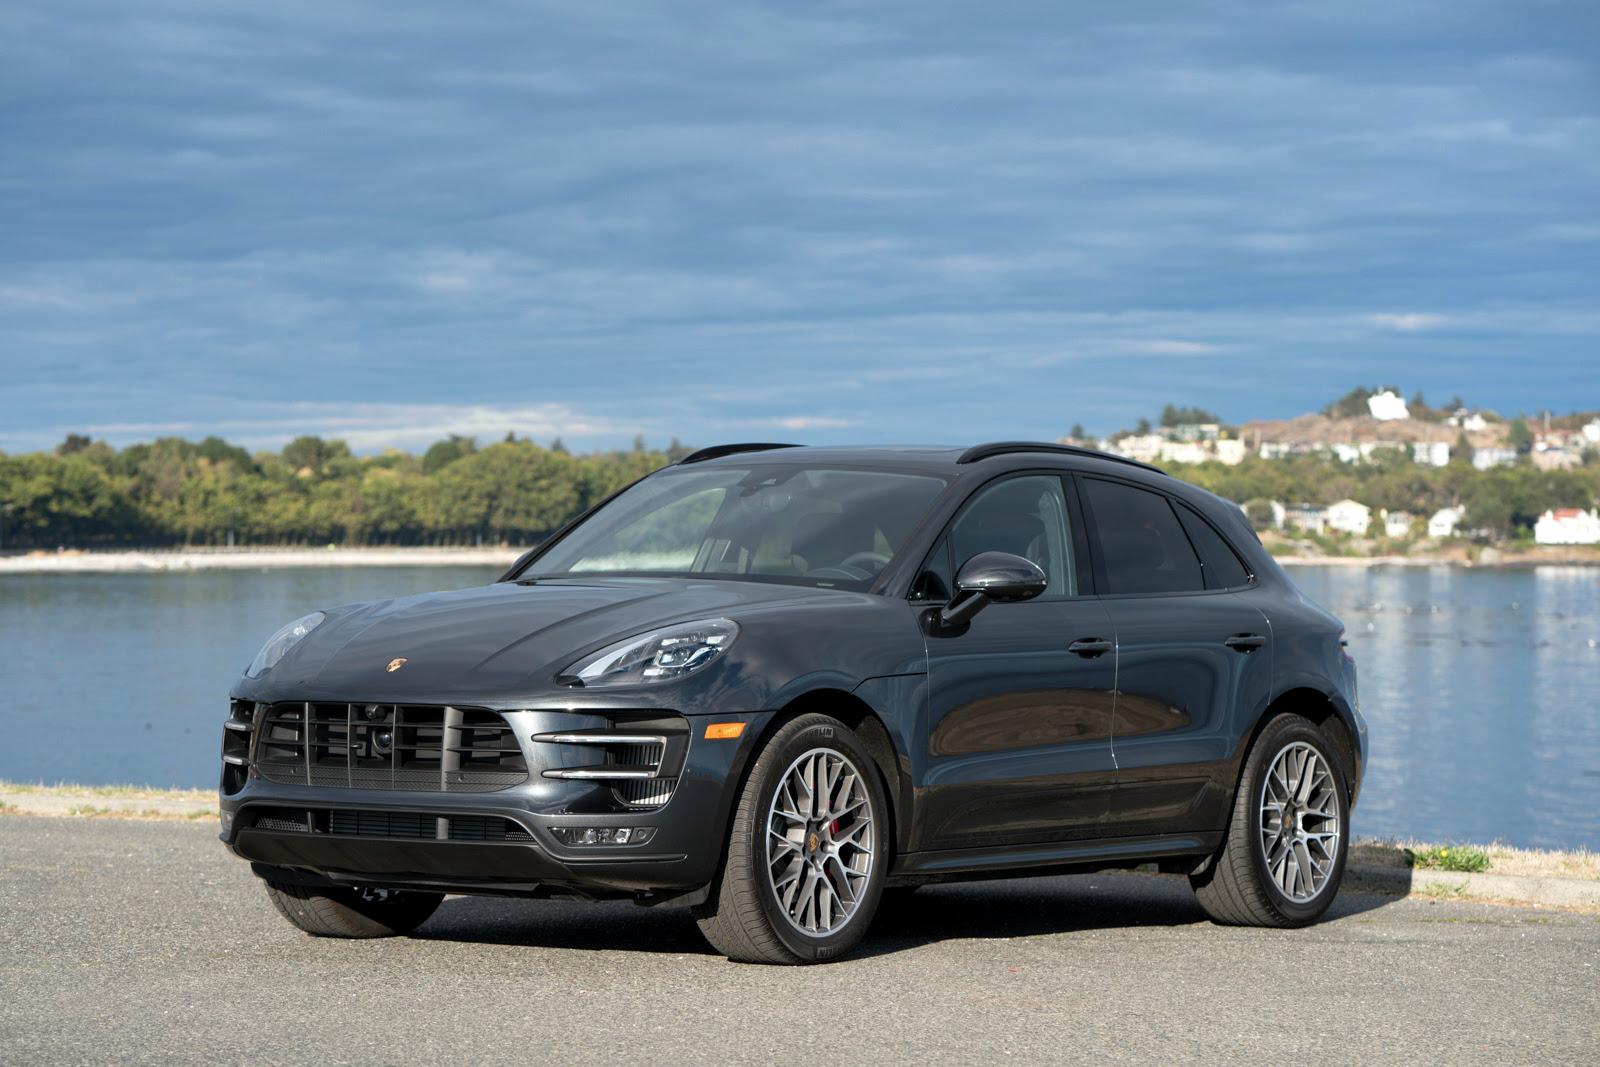 2017 Porsche Macan Turbo For Sale In Victoria Bc At Silver